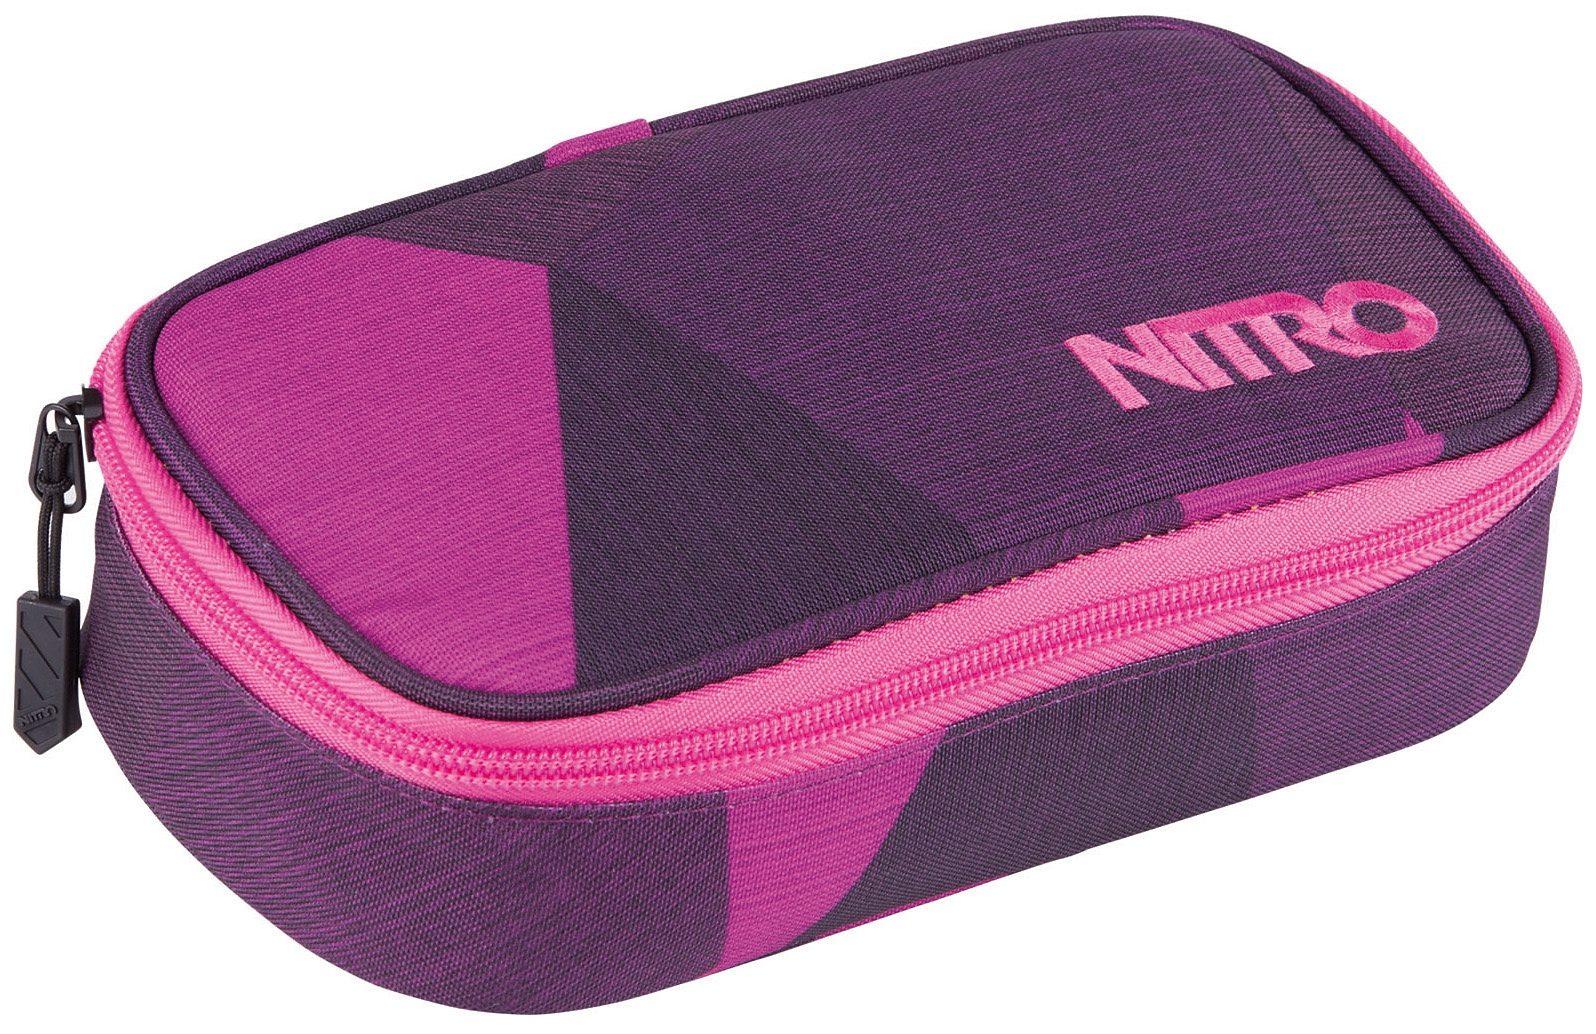 Nitro Federmäppchen, »Pencil Case XL - fragments purple«